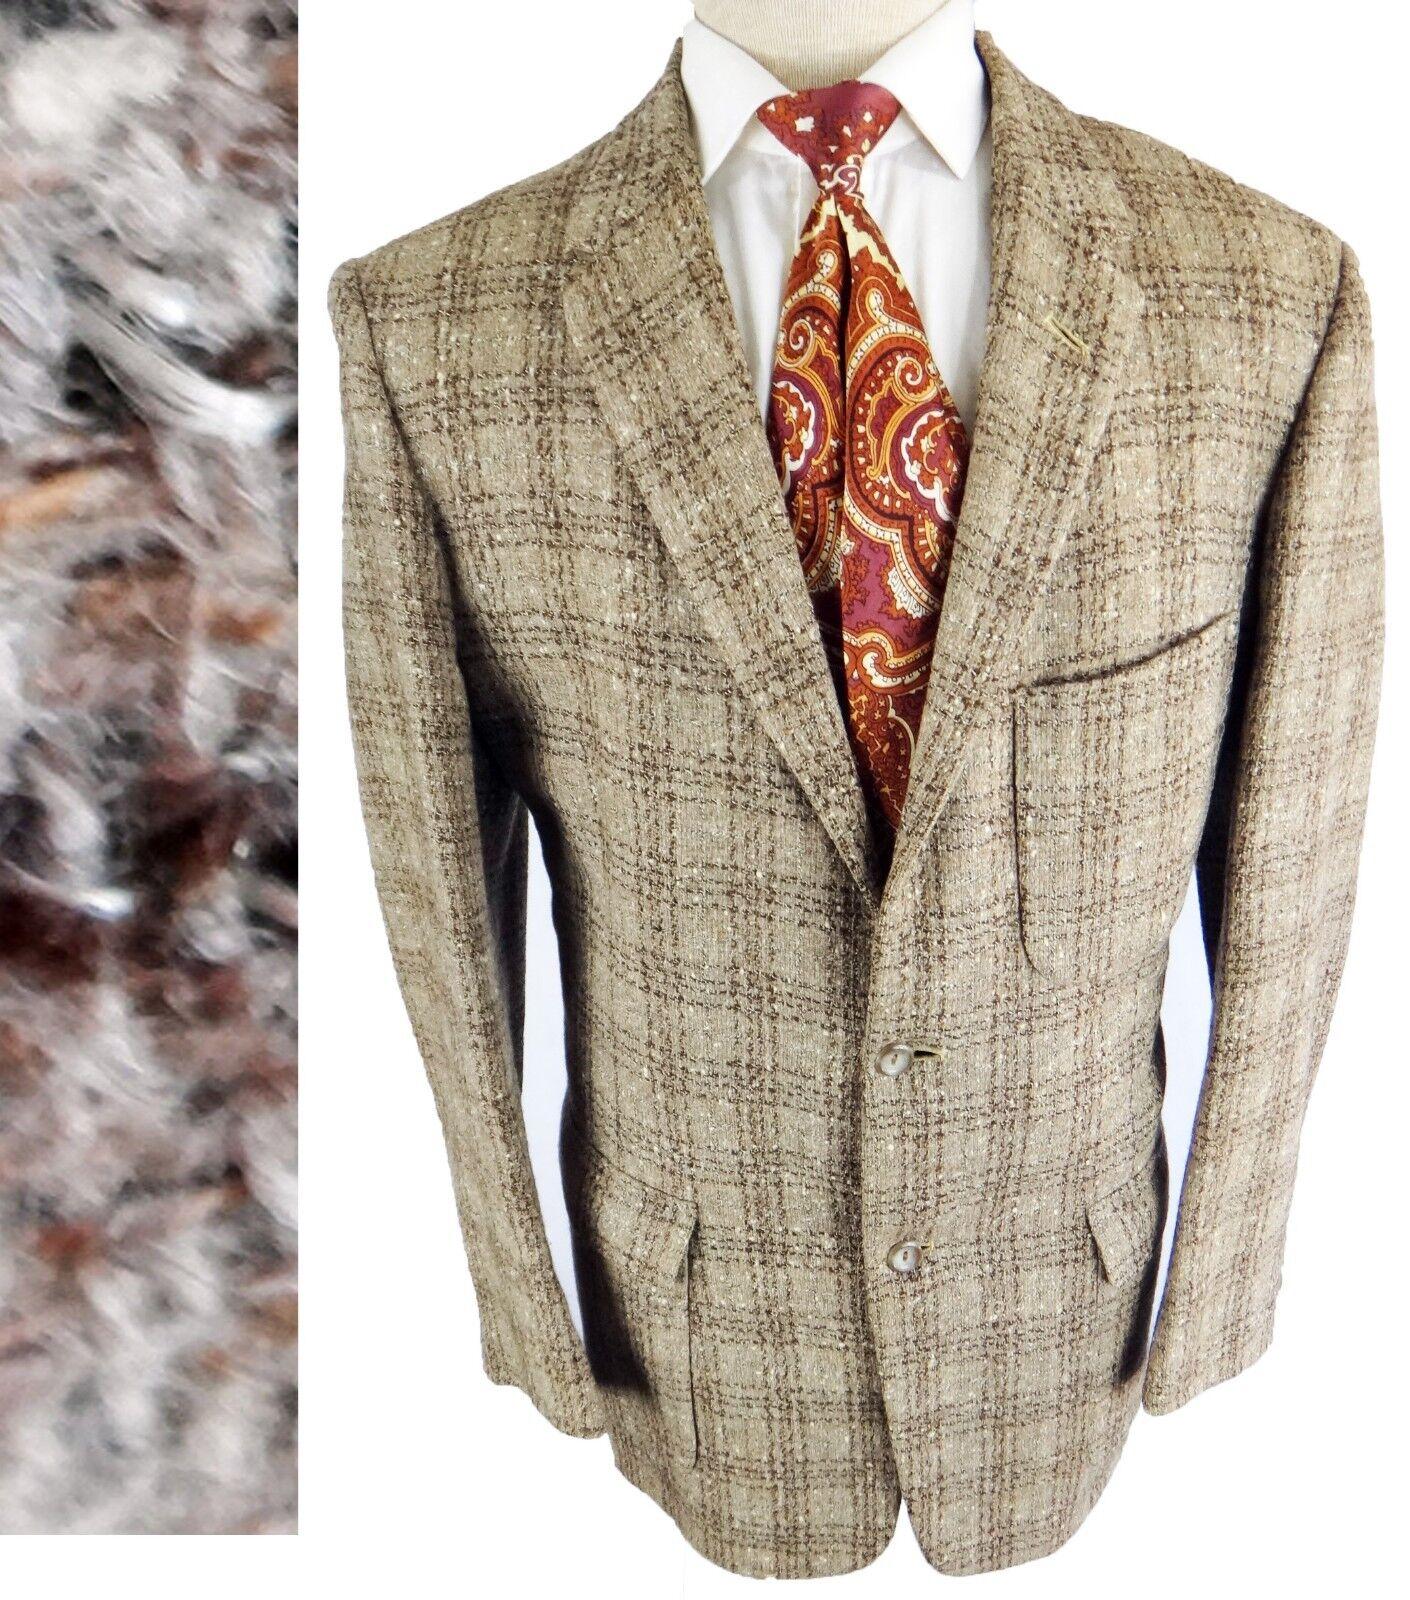 VINTAGE 2 button Chunky weave woven 1940 1950 plaid Braun glen raw mohair union